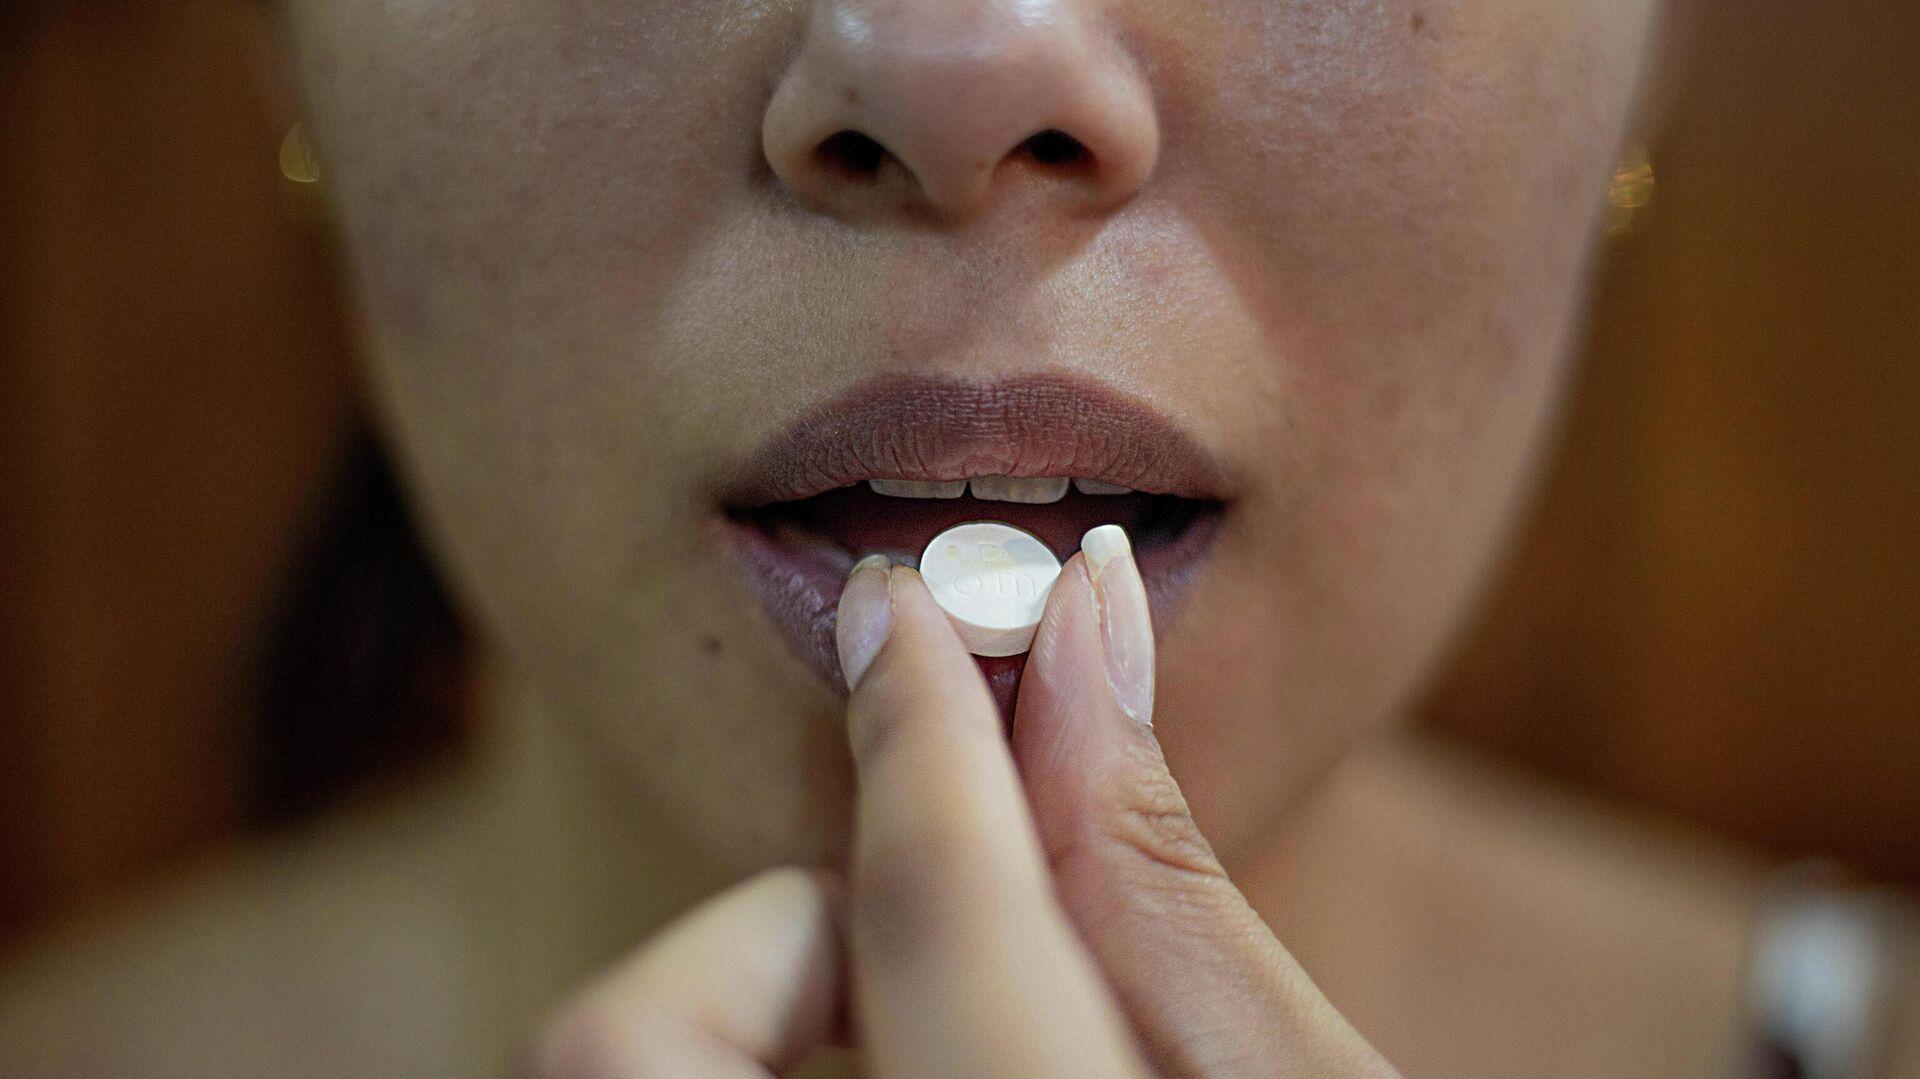 Una persona toma un medicamento - Sputnik Mundo, 1920, 23.08.2021